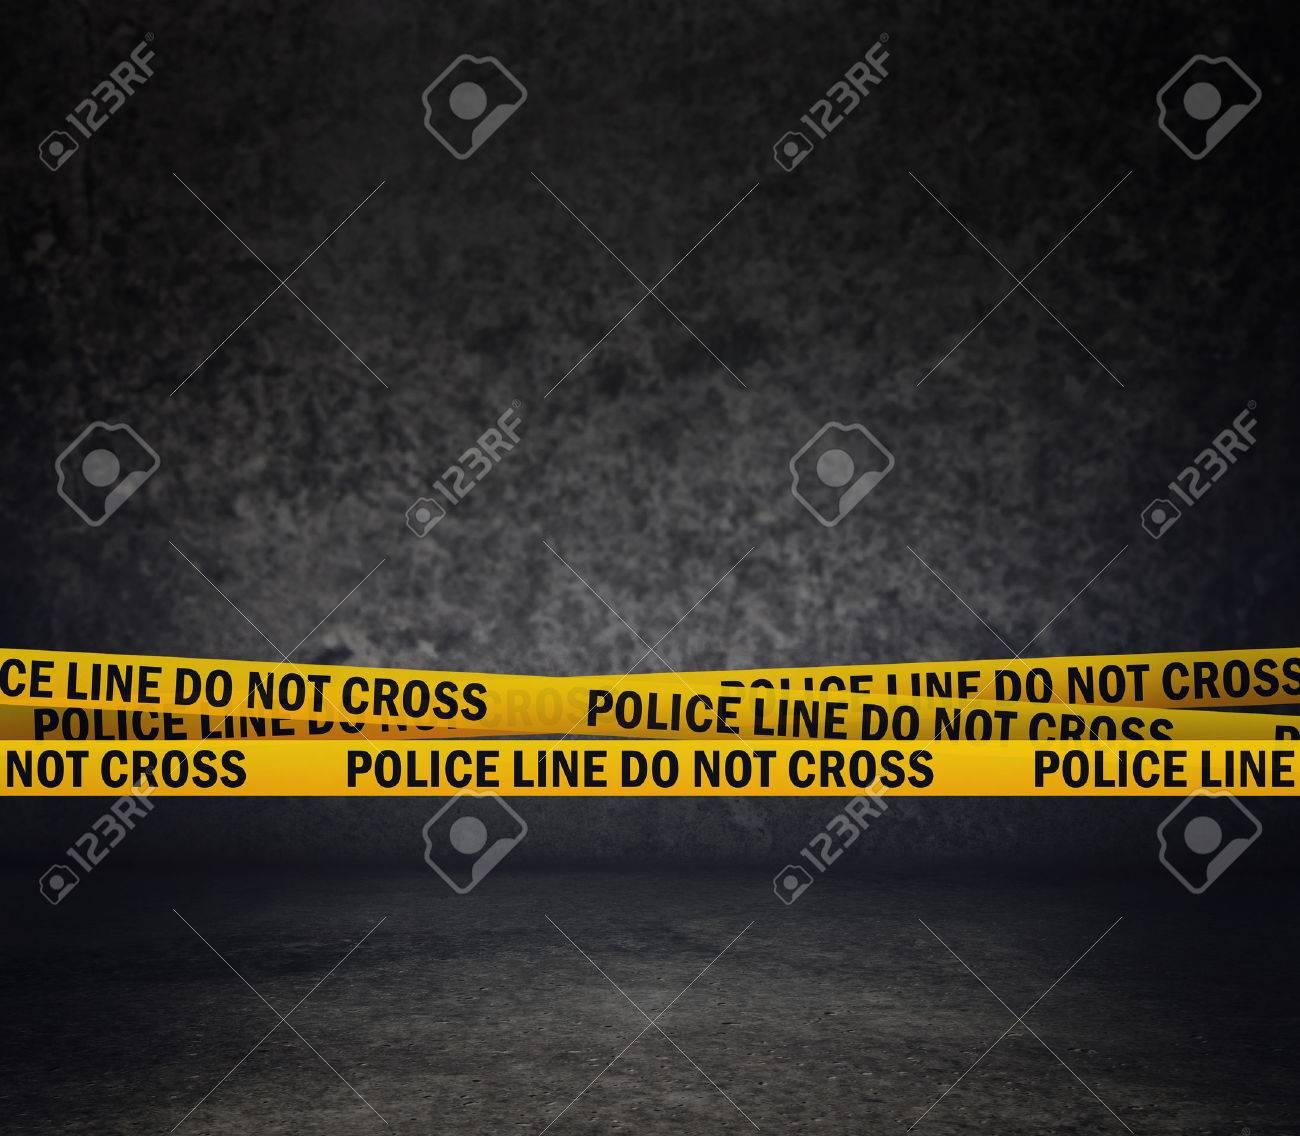 Police Line Do Not Cross Yellow Headband Tape Murder Scene Police Ribbon - 30840635